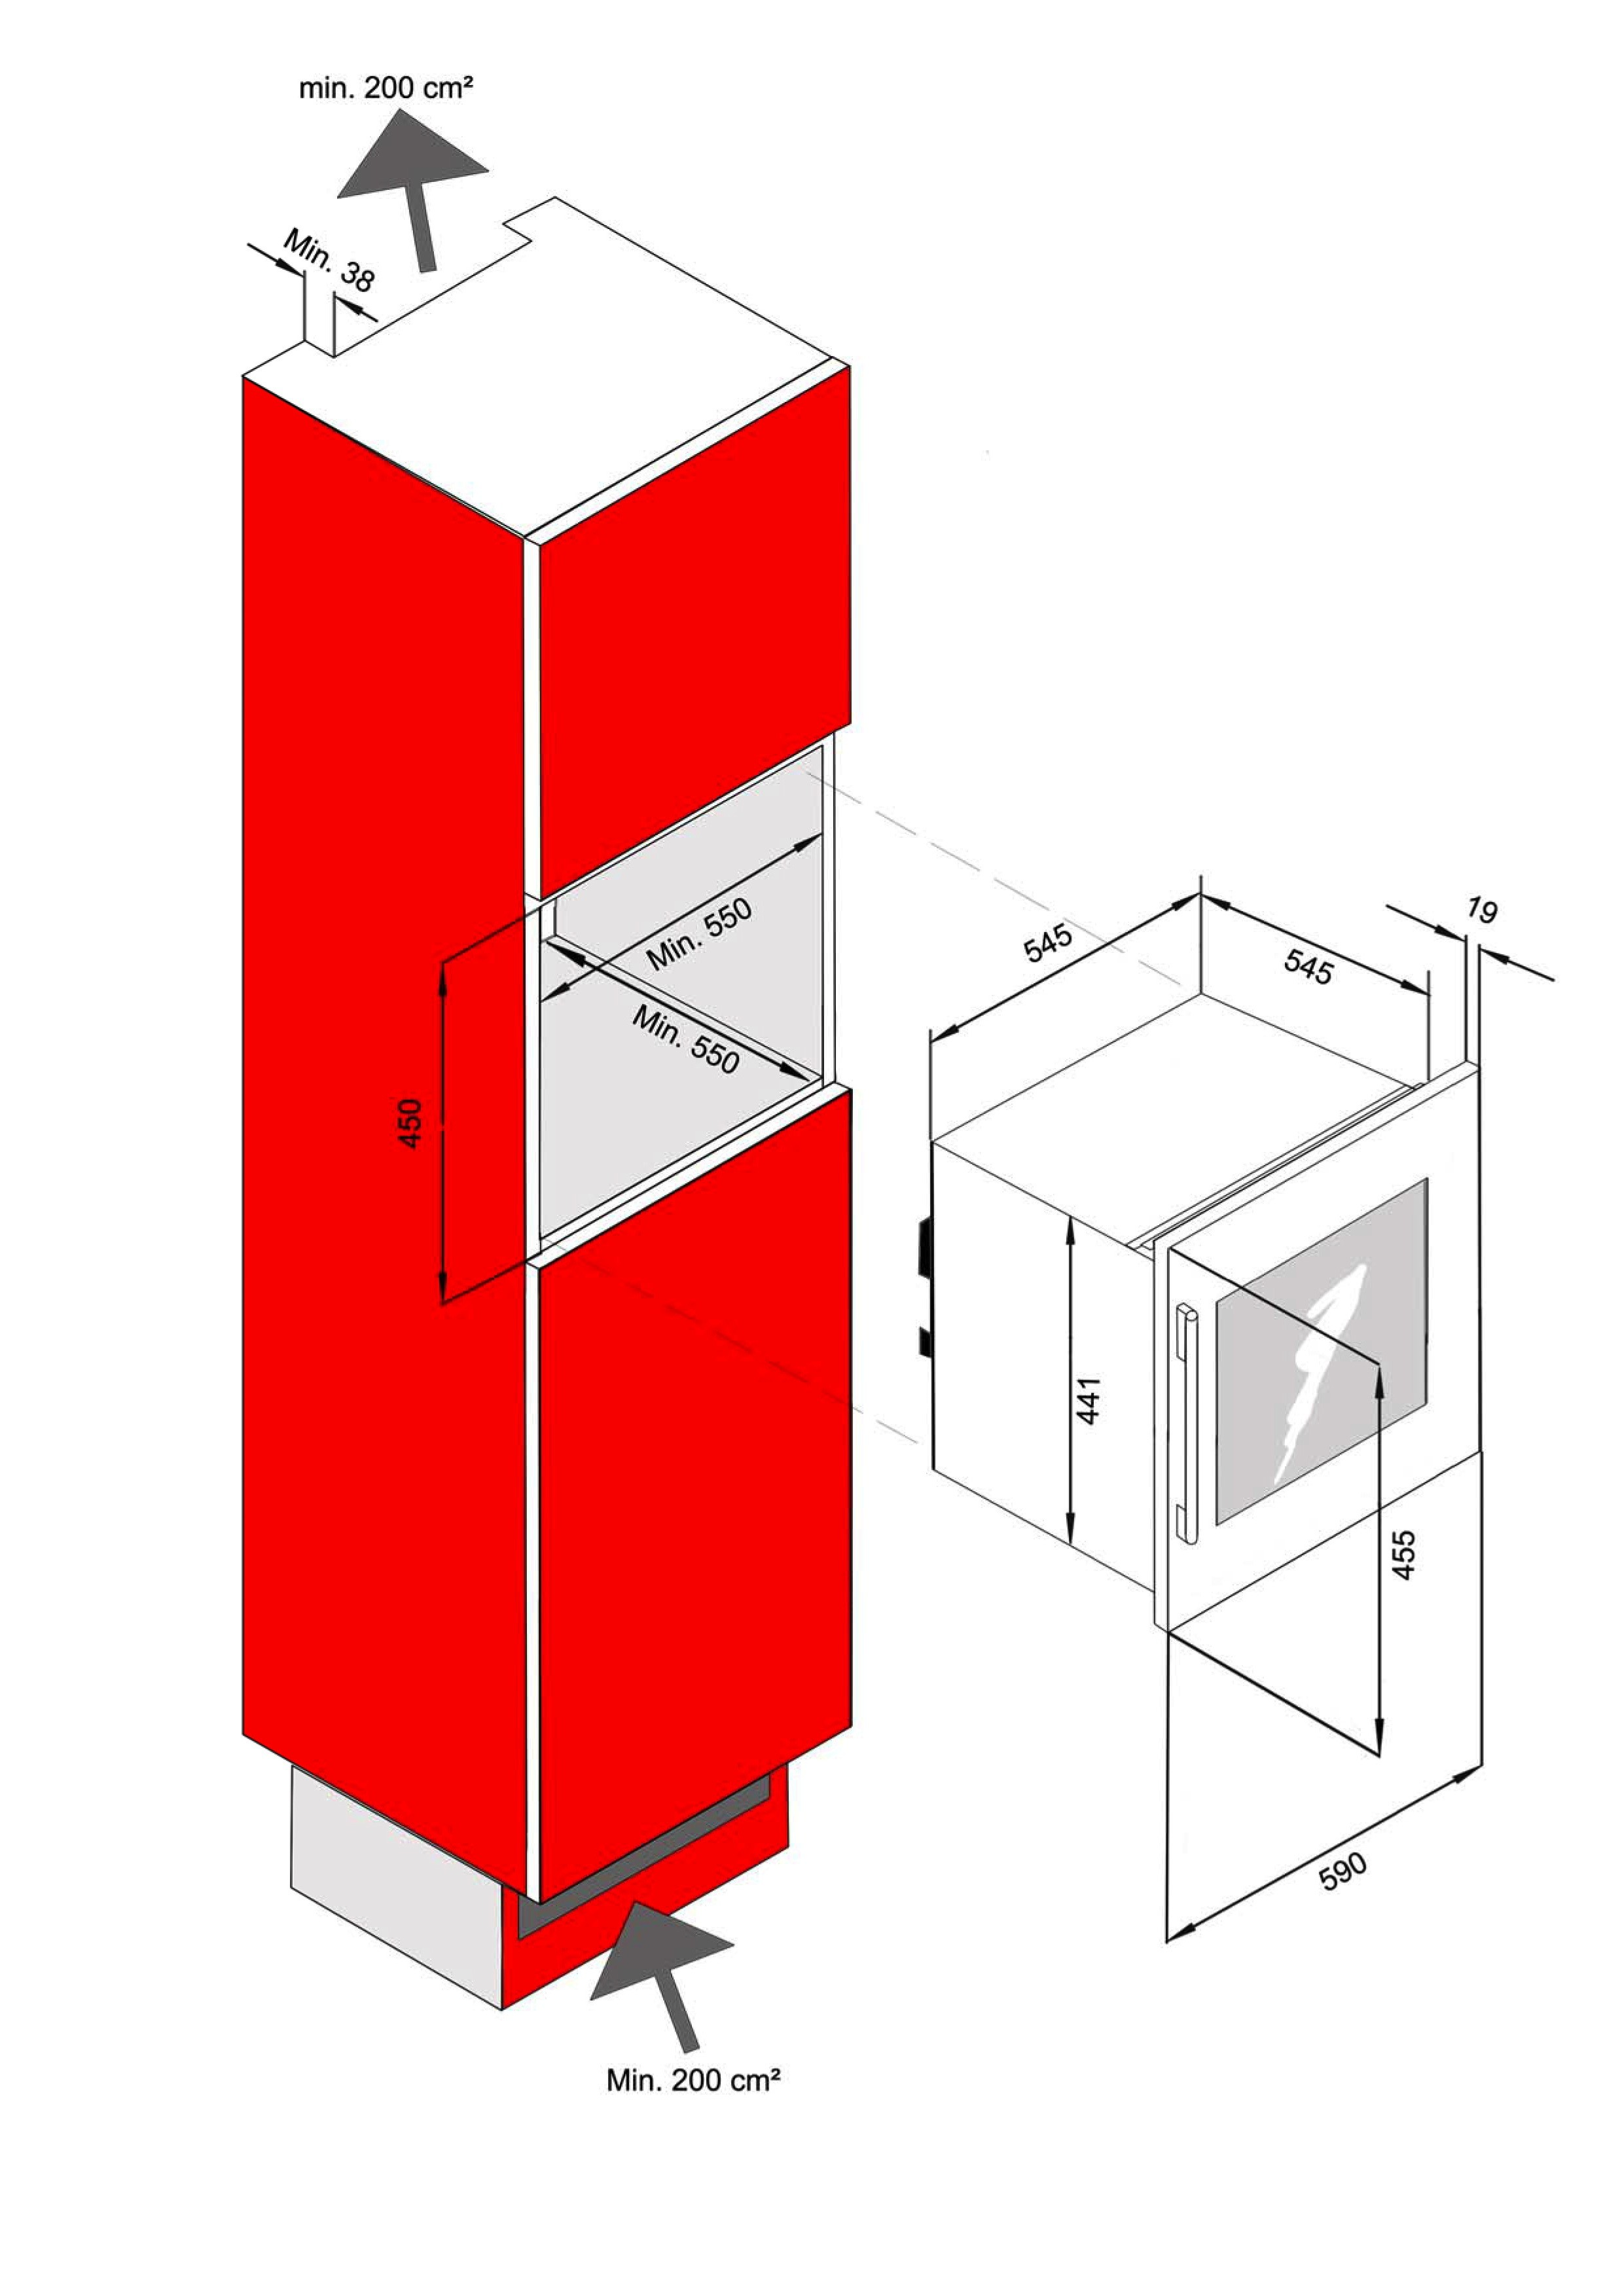 vinoteca de compartimento nico para 24 botellas avintage av24xi 1 wine cooler. Black Bedroom Furniture Sets. Home Design Ideas